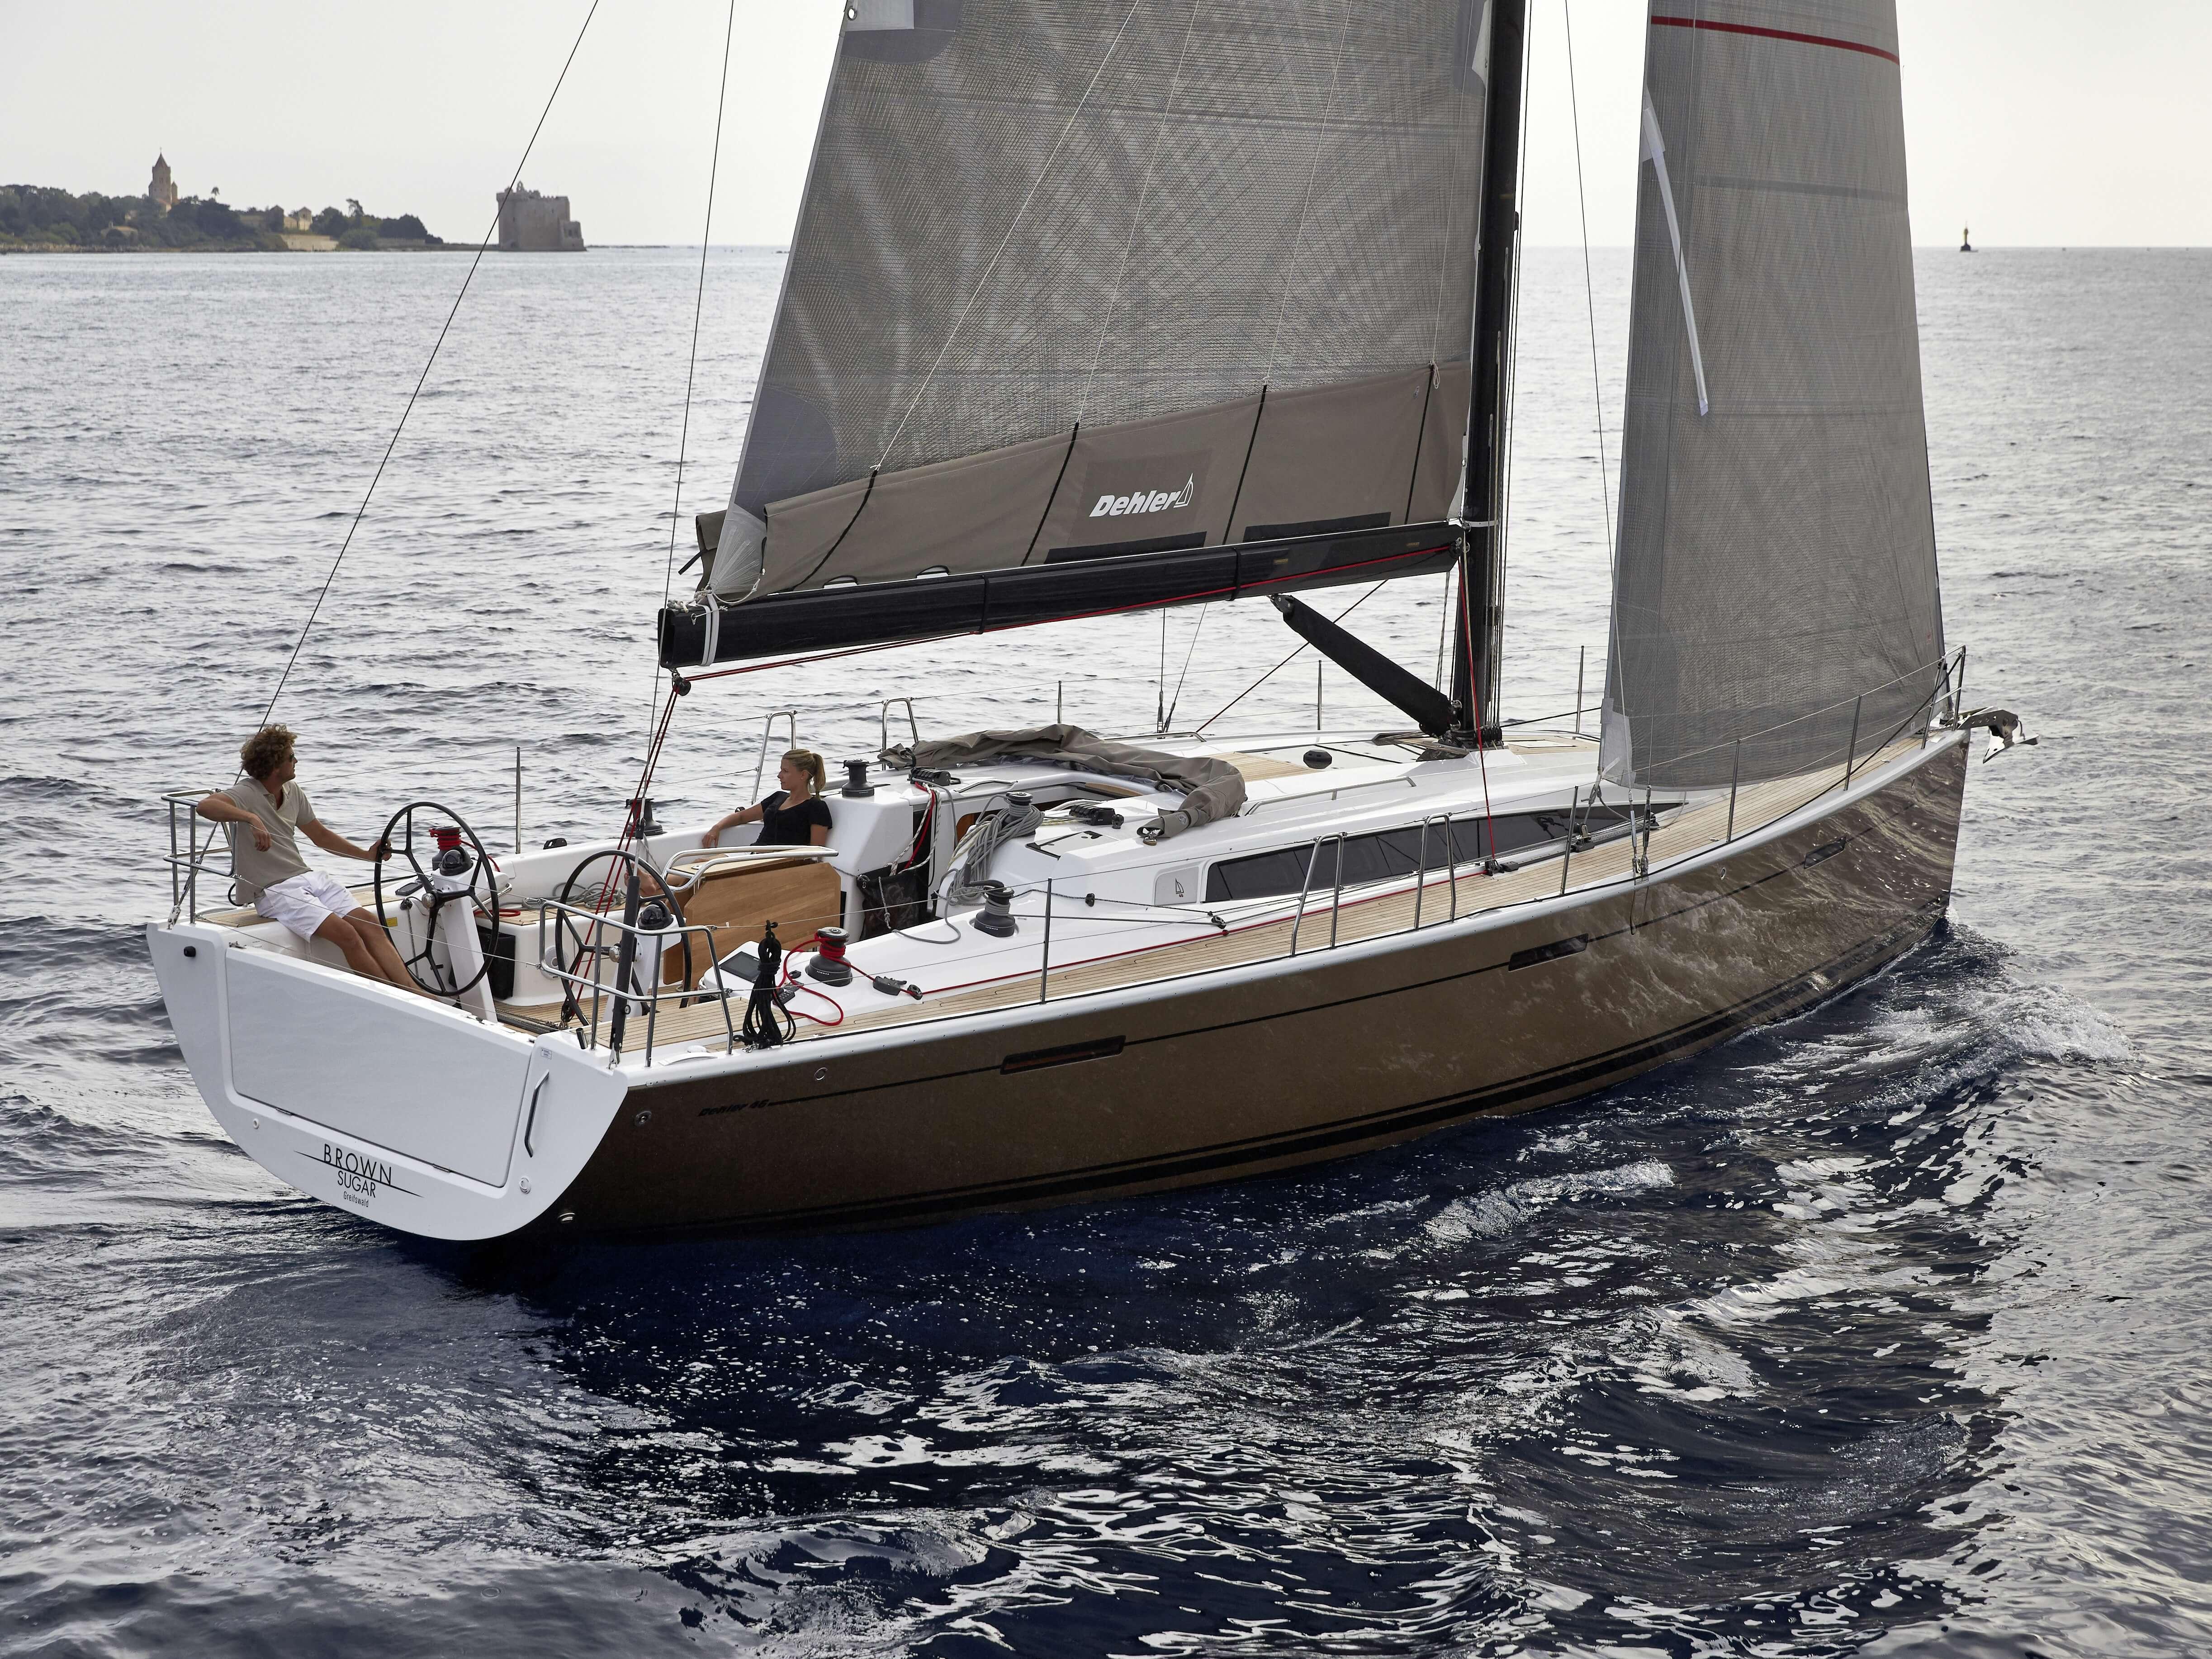 Dehler 46 Exterior Sailing | foresail, mainsail, rear | Dehler